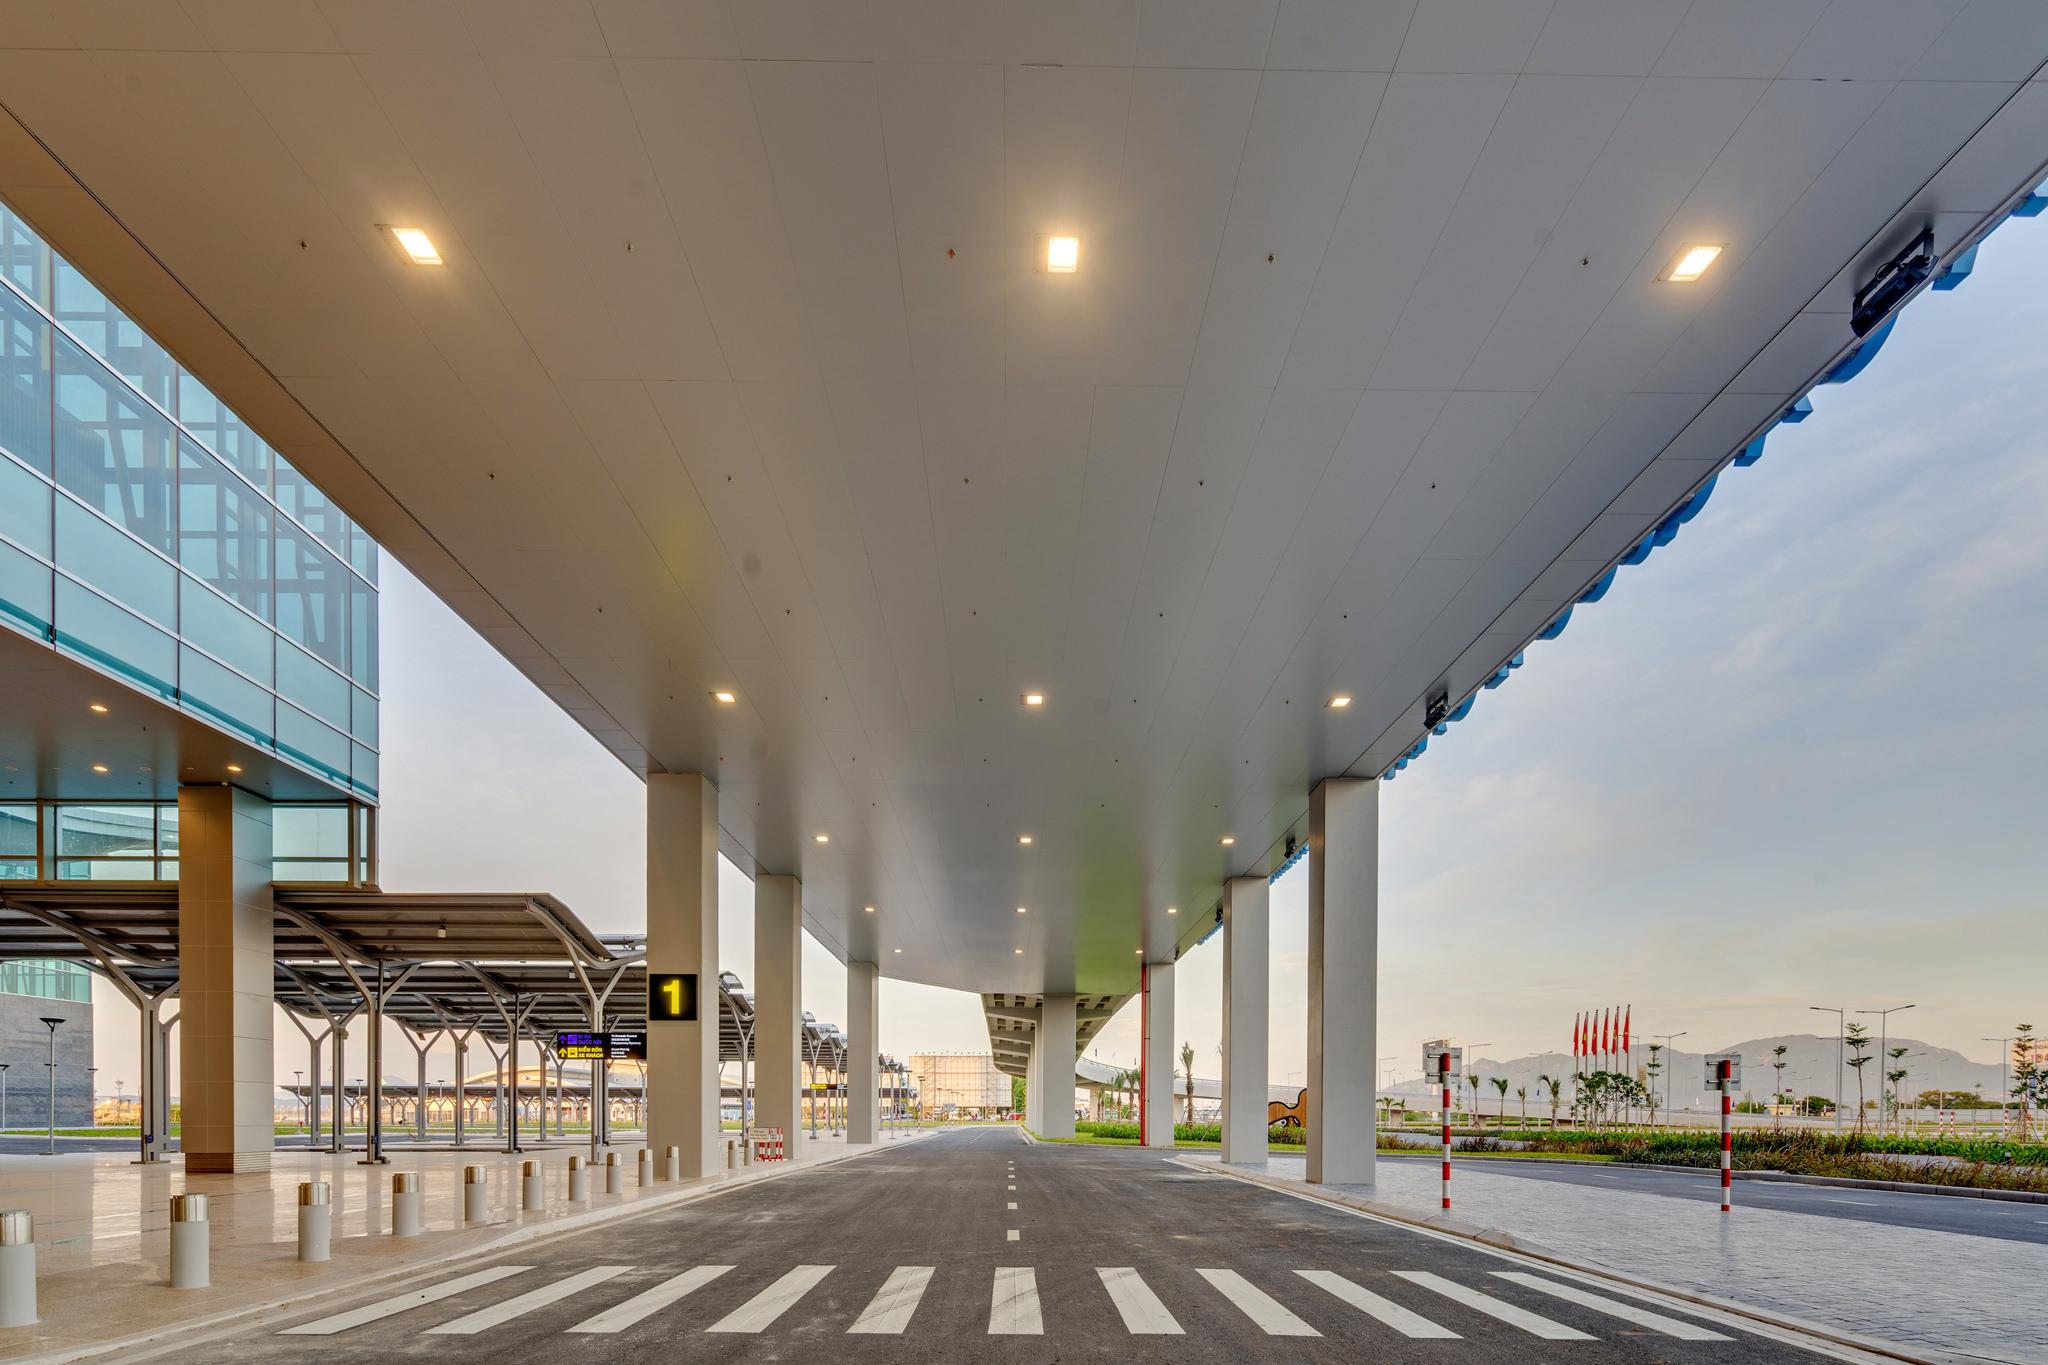 20180626 - Cam Ranh Airport - Architecture - 0034.jpg